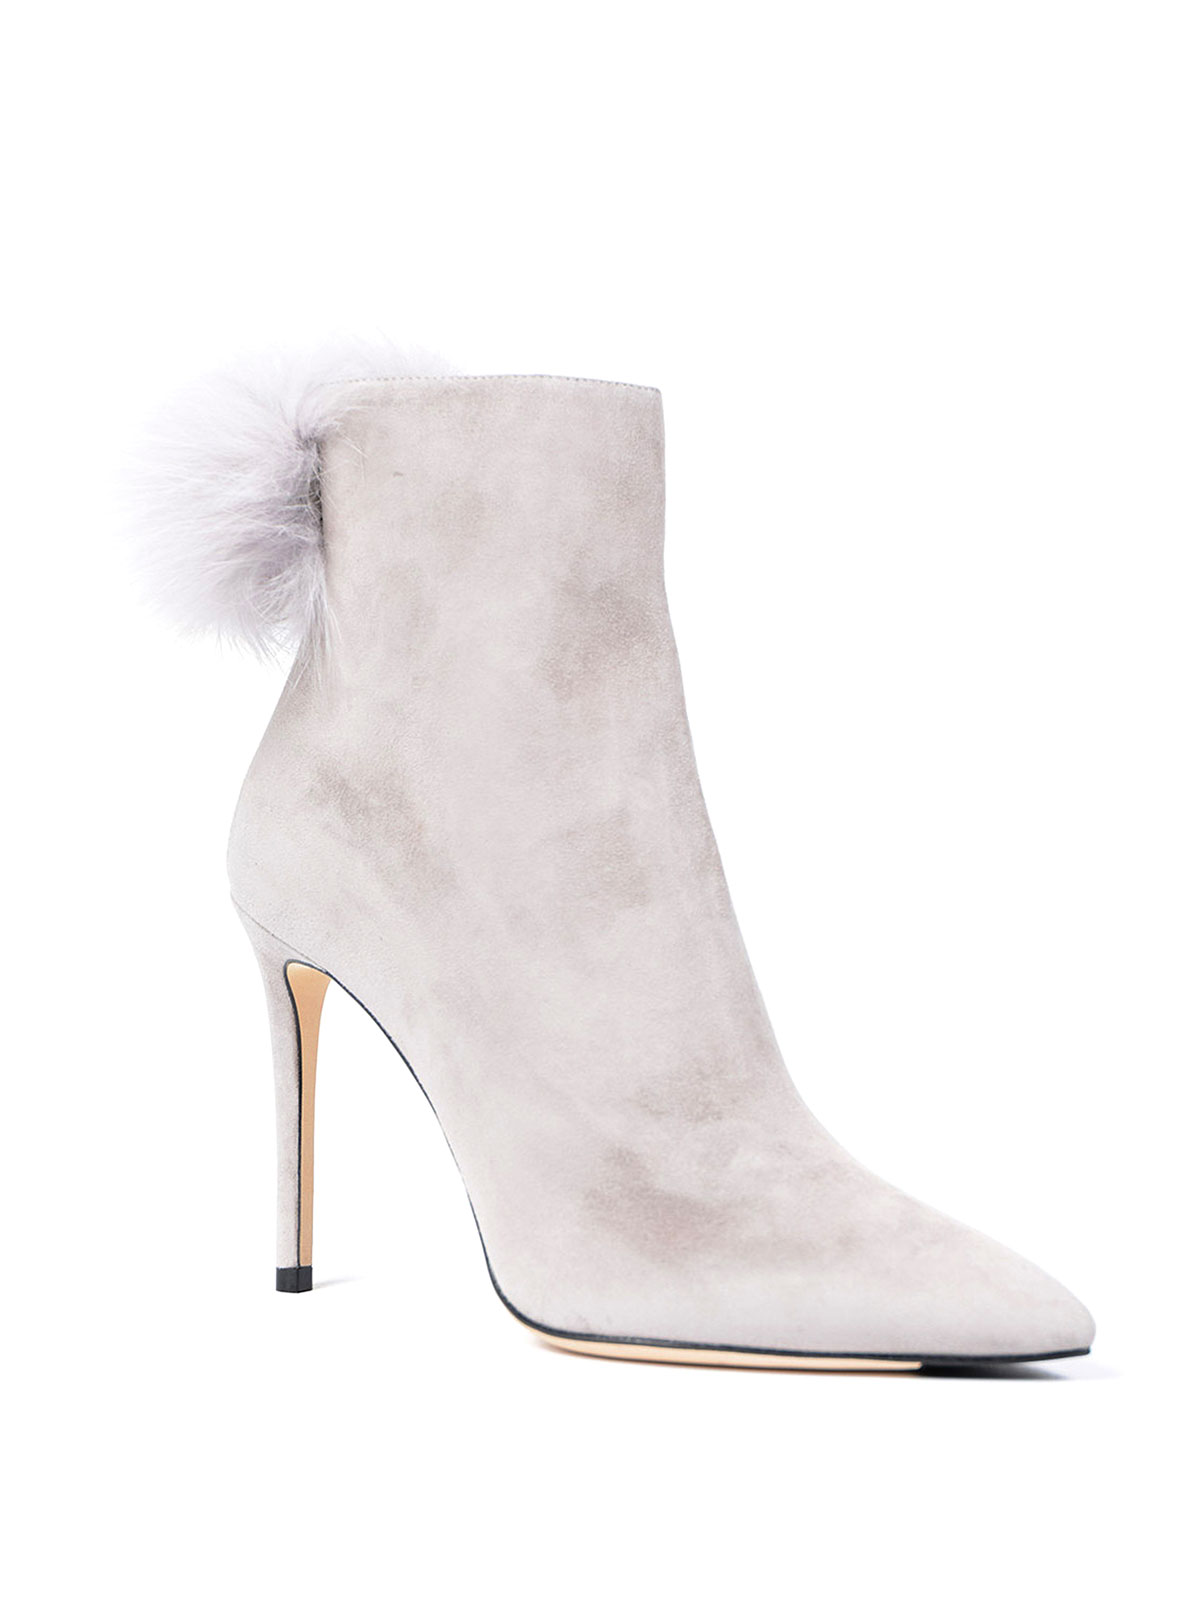 e1508de96c84 JIMMY CHOO  ankle boots online - Tesler fur pom pom suede booties